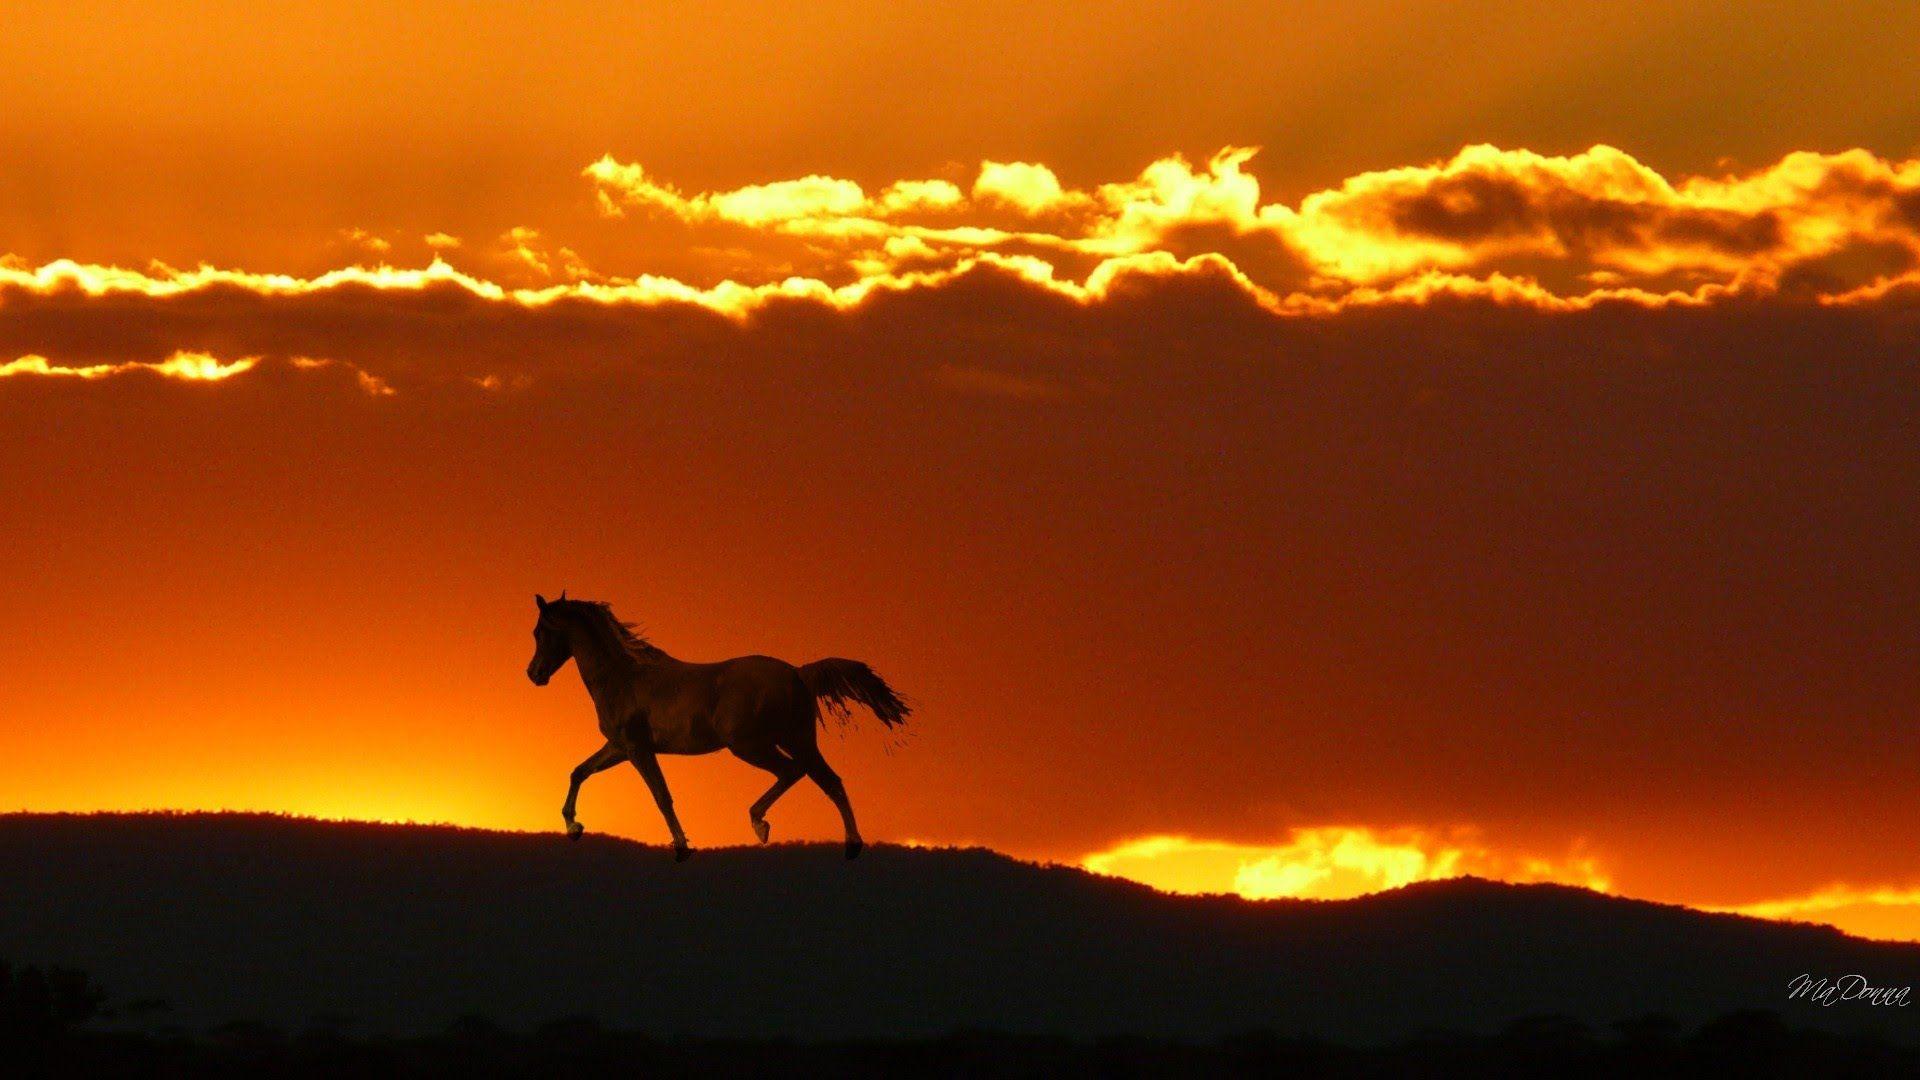 Beautiful Wallpaper Horse Sunrise - e1f918b2e9c8d7001a9baca1287de8ed  Pic_834065.jpg